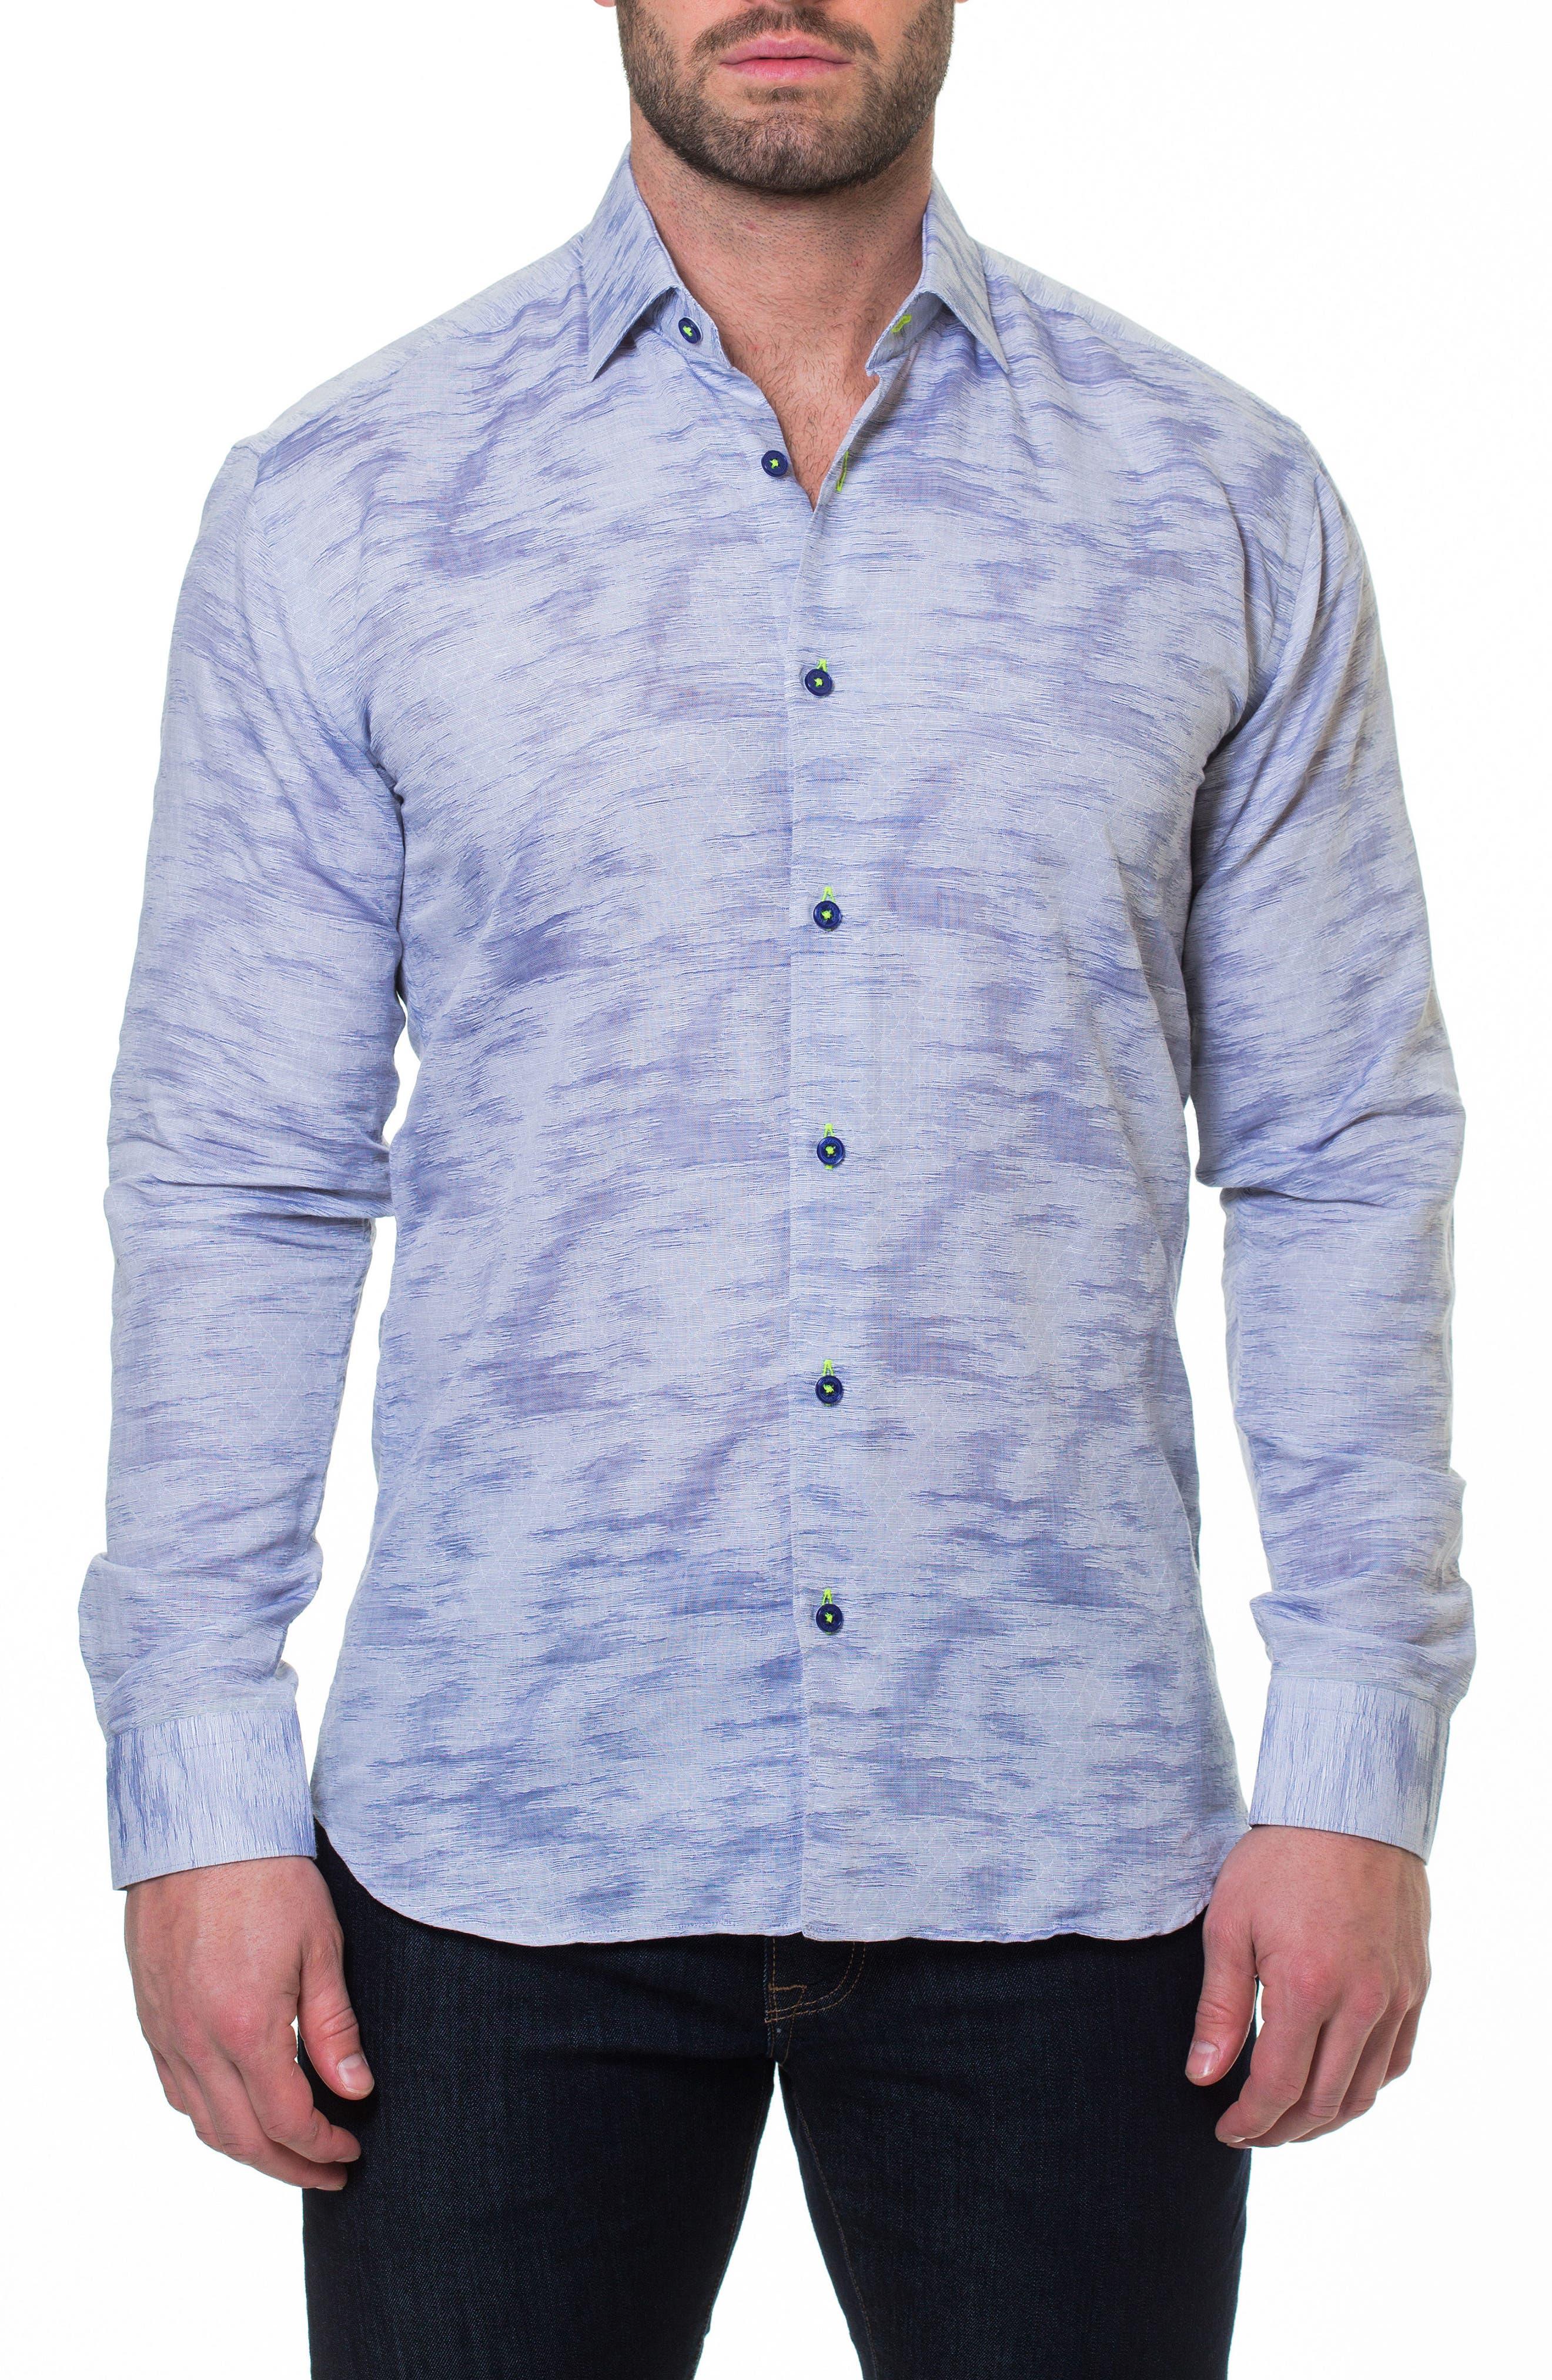 Luxor Richter Slim Fit Sport Shirt,                             Alternate thumbnail 3, color,                             Grey